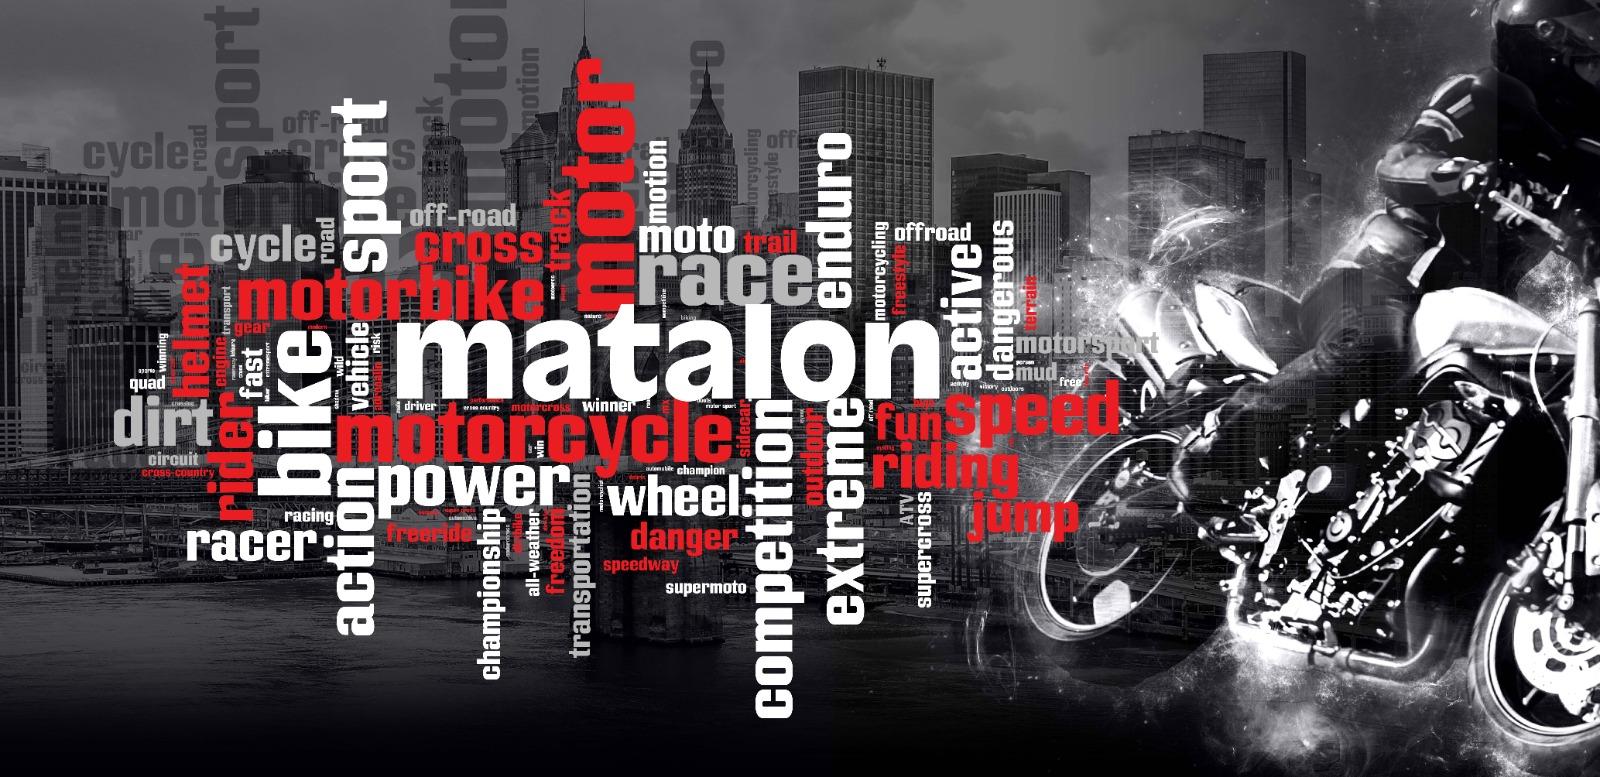 matalon + מילים הקשורות באופנועים